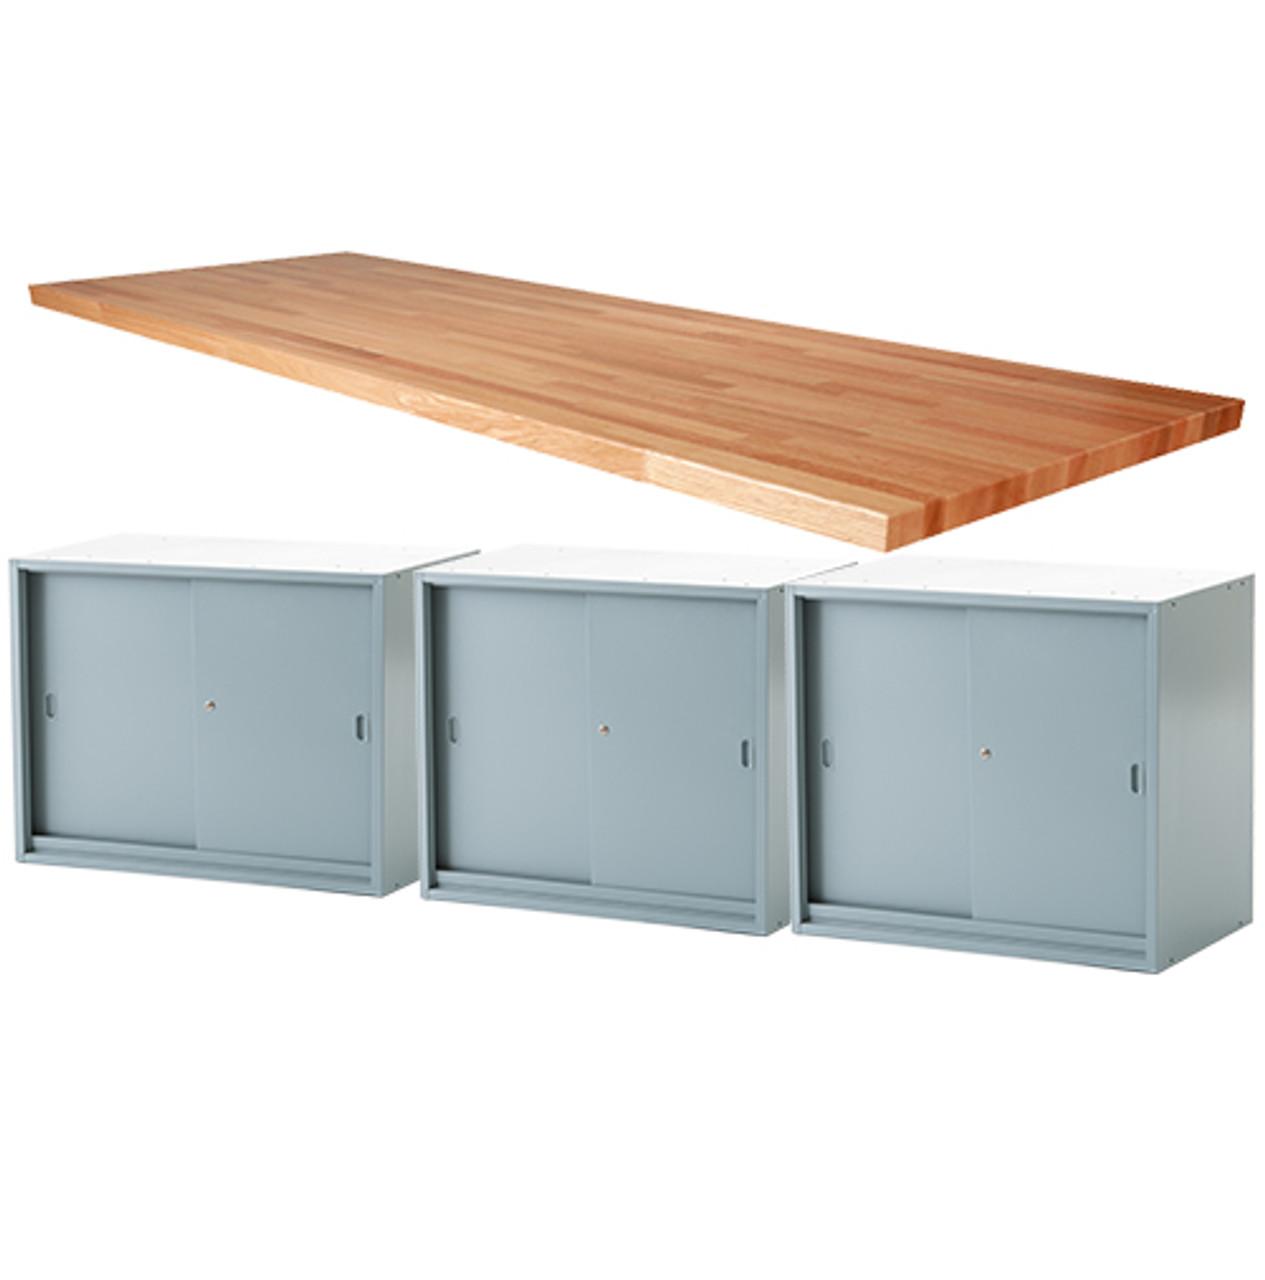 Astounding Midwest Work Bench With 3 Sliding Door Units 1 3 4 Top Beatyapartments Chair Design Images Beatyapartmentscom